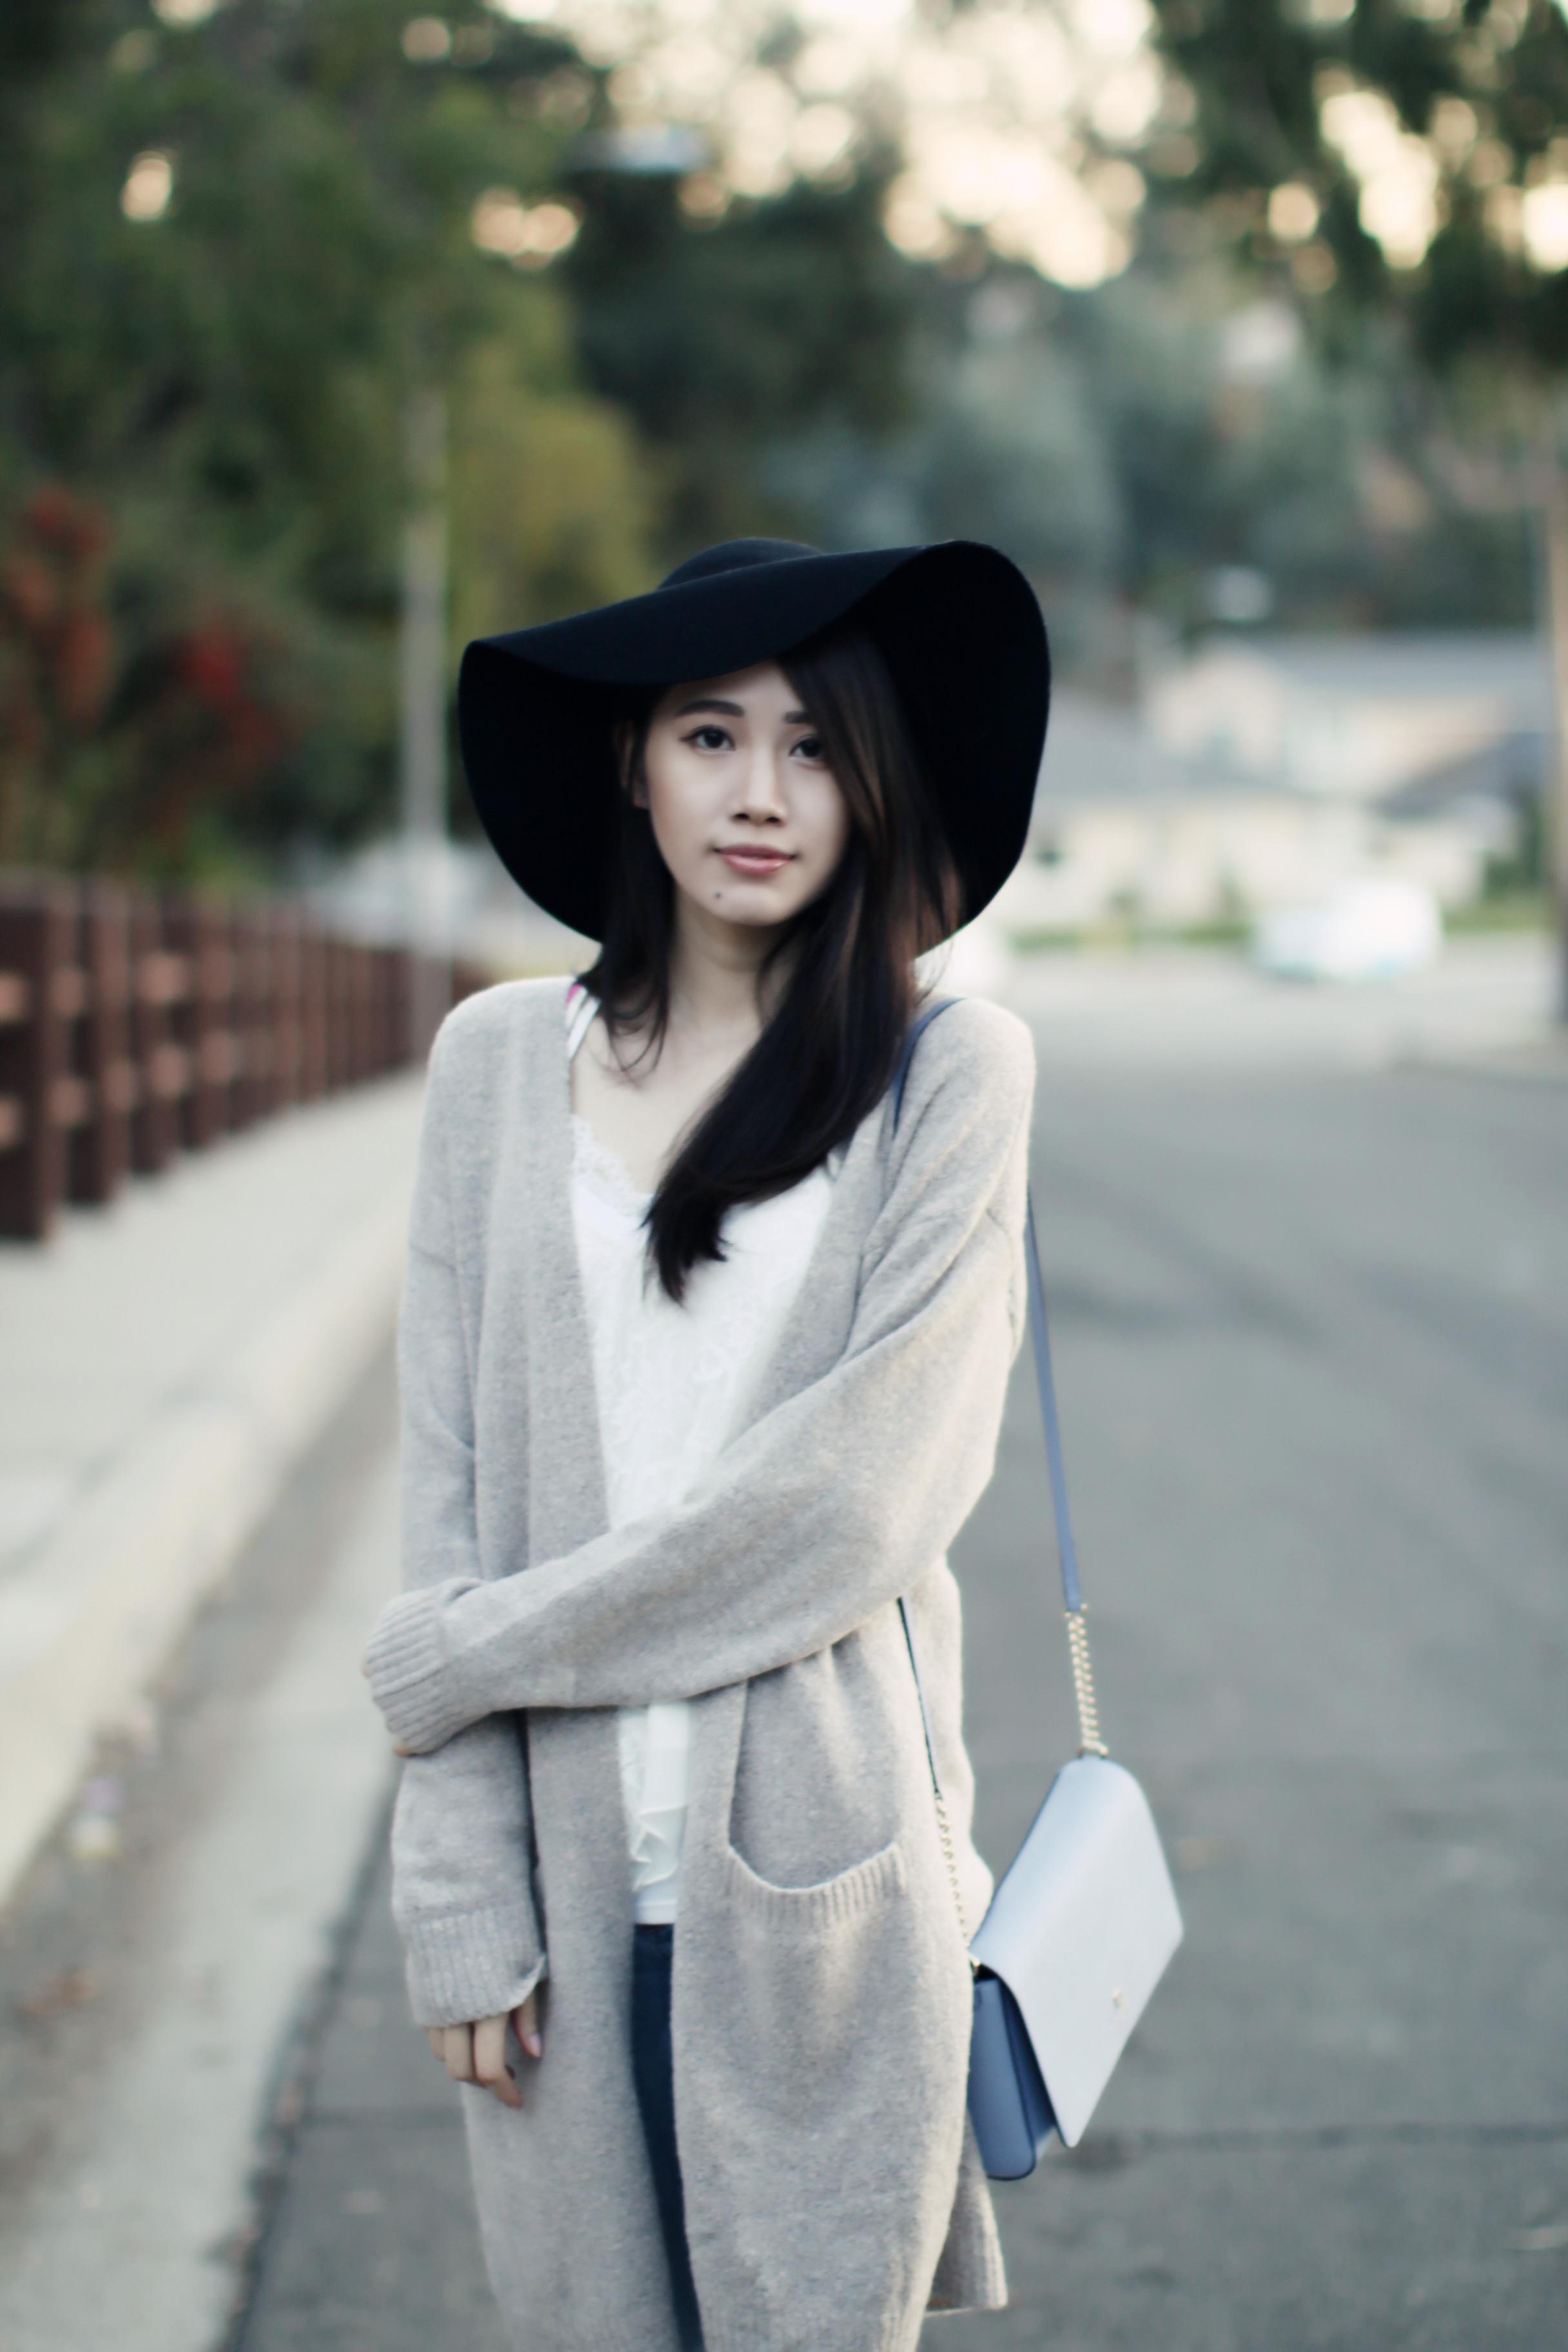 3843-ootd-fashion-style-outfitoftheday-wiwt-nordstrom-abercrombie-bohemian-fallfashion-forever21-f21-f21xme-koreanfashion-elizabeeetht-clothestoyouuu